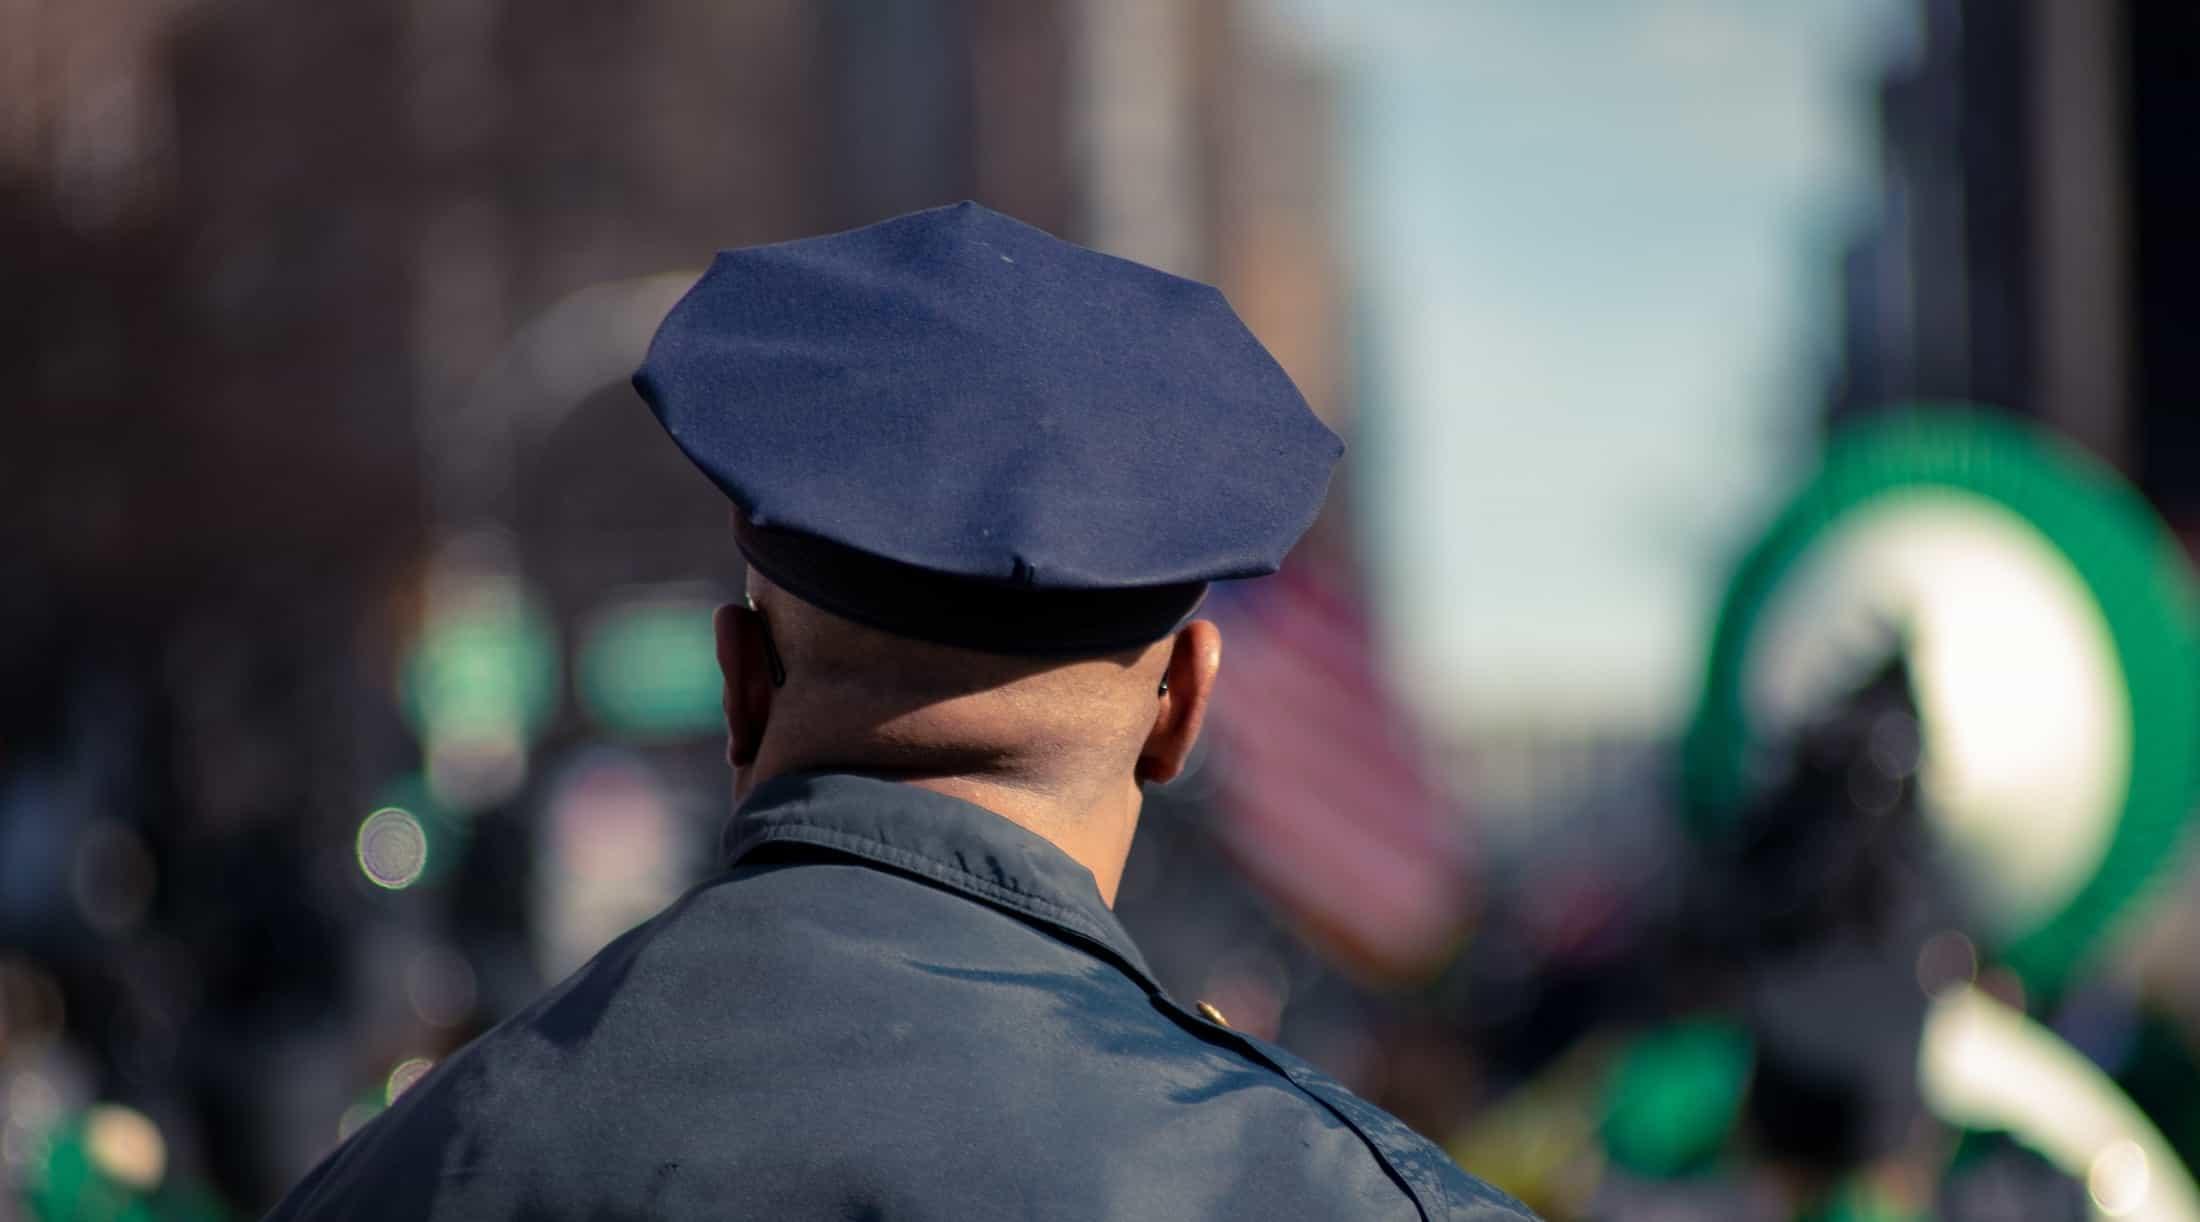 New York local authorities